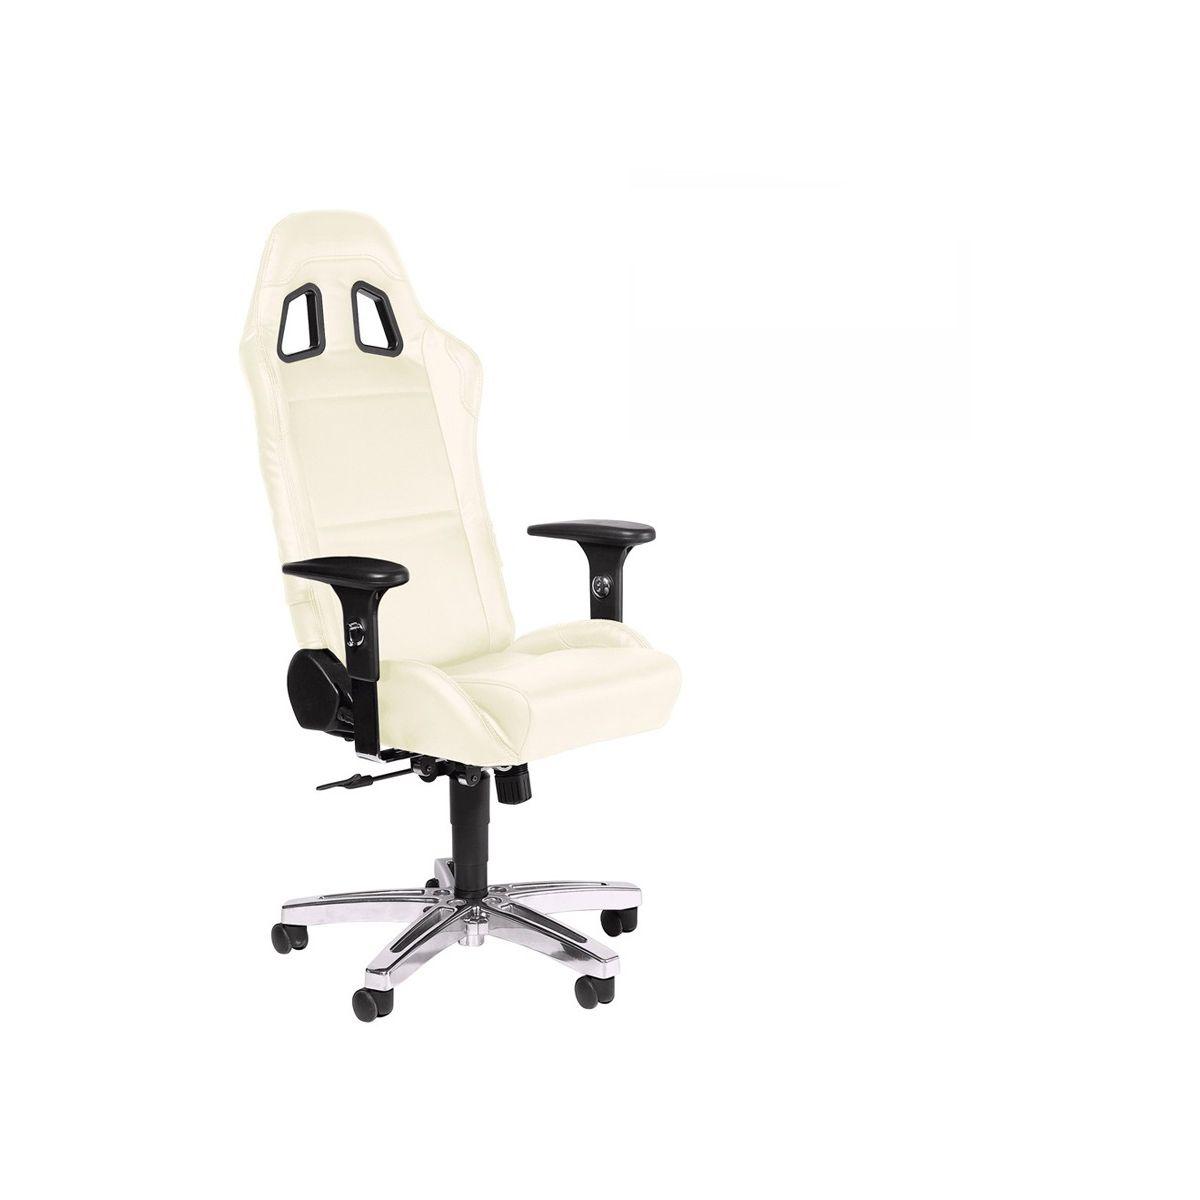 ACC. . Office White (photo)